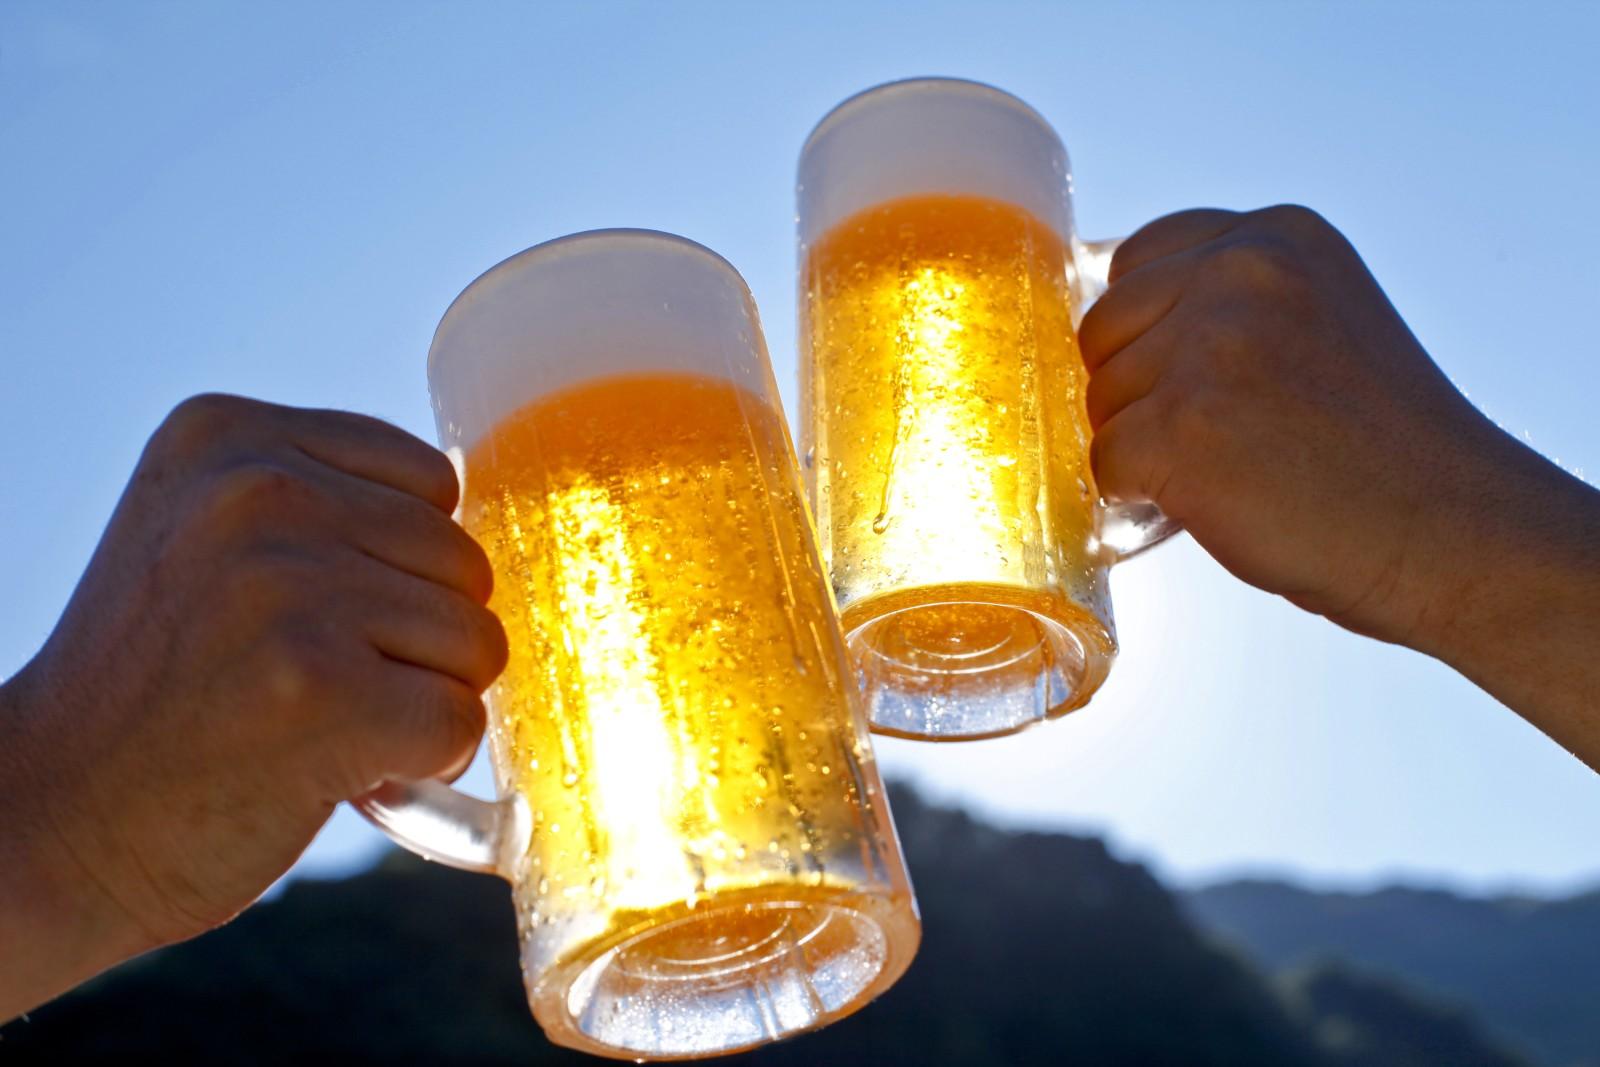 Biermischgetränke – | ||| | || CODECHECK.INFO